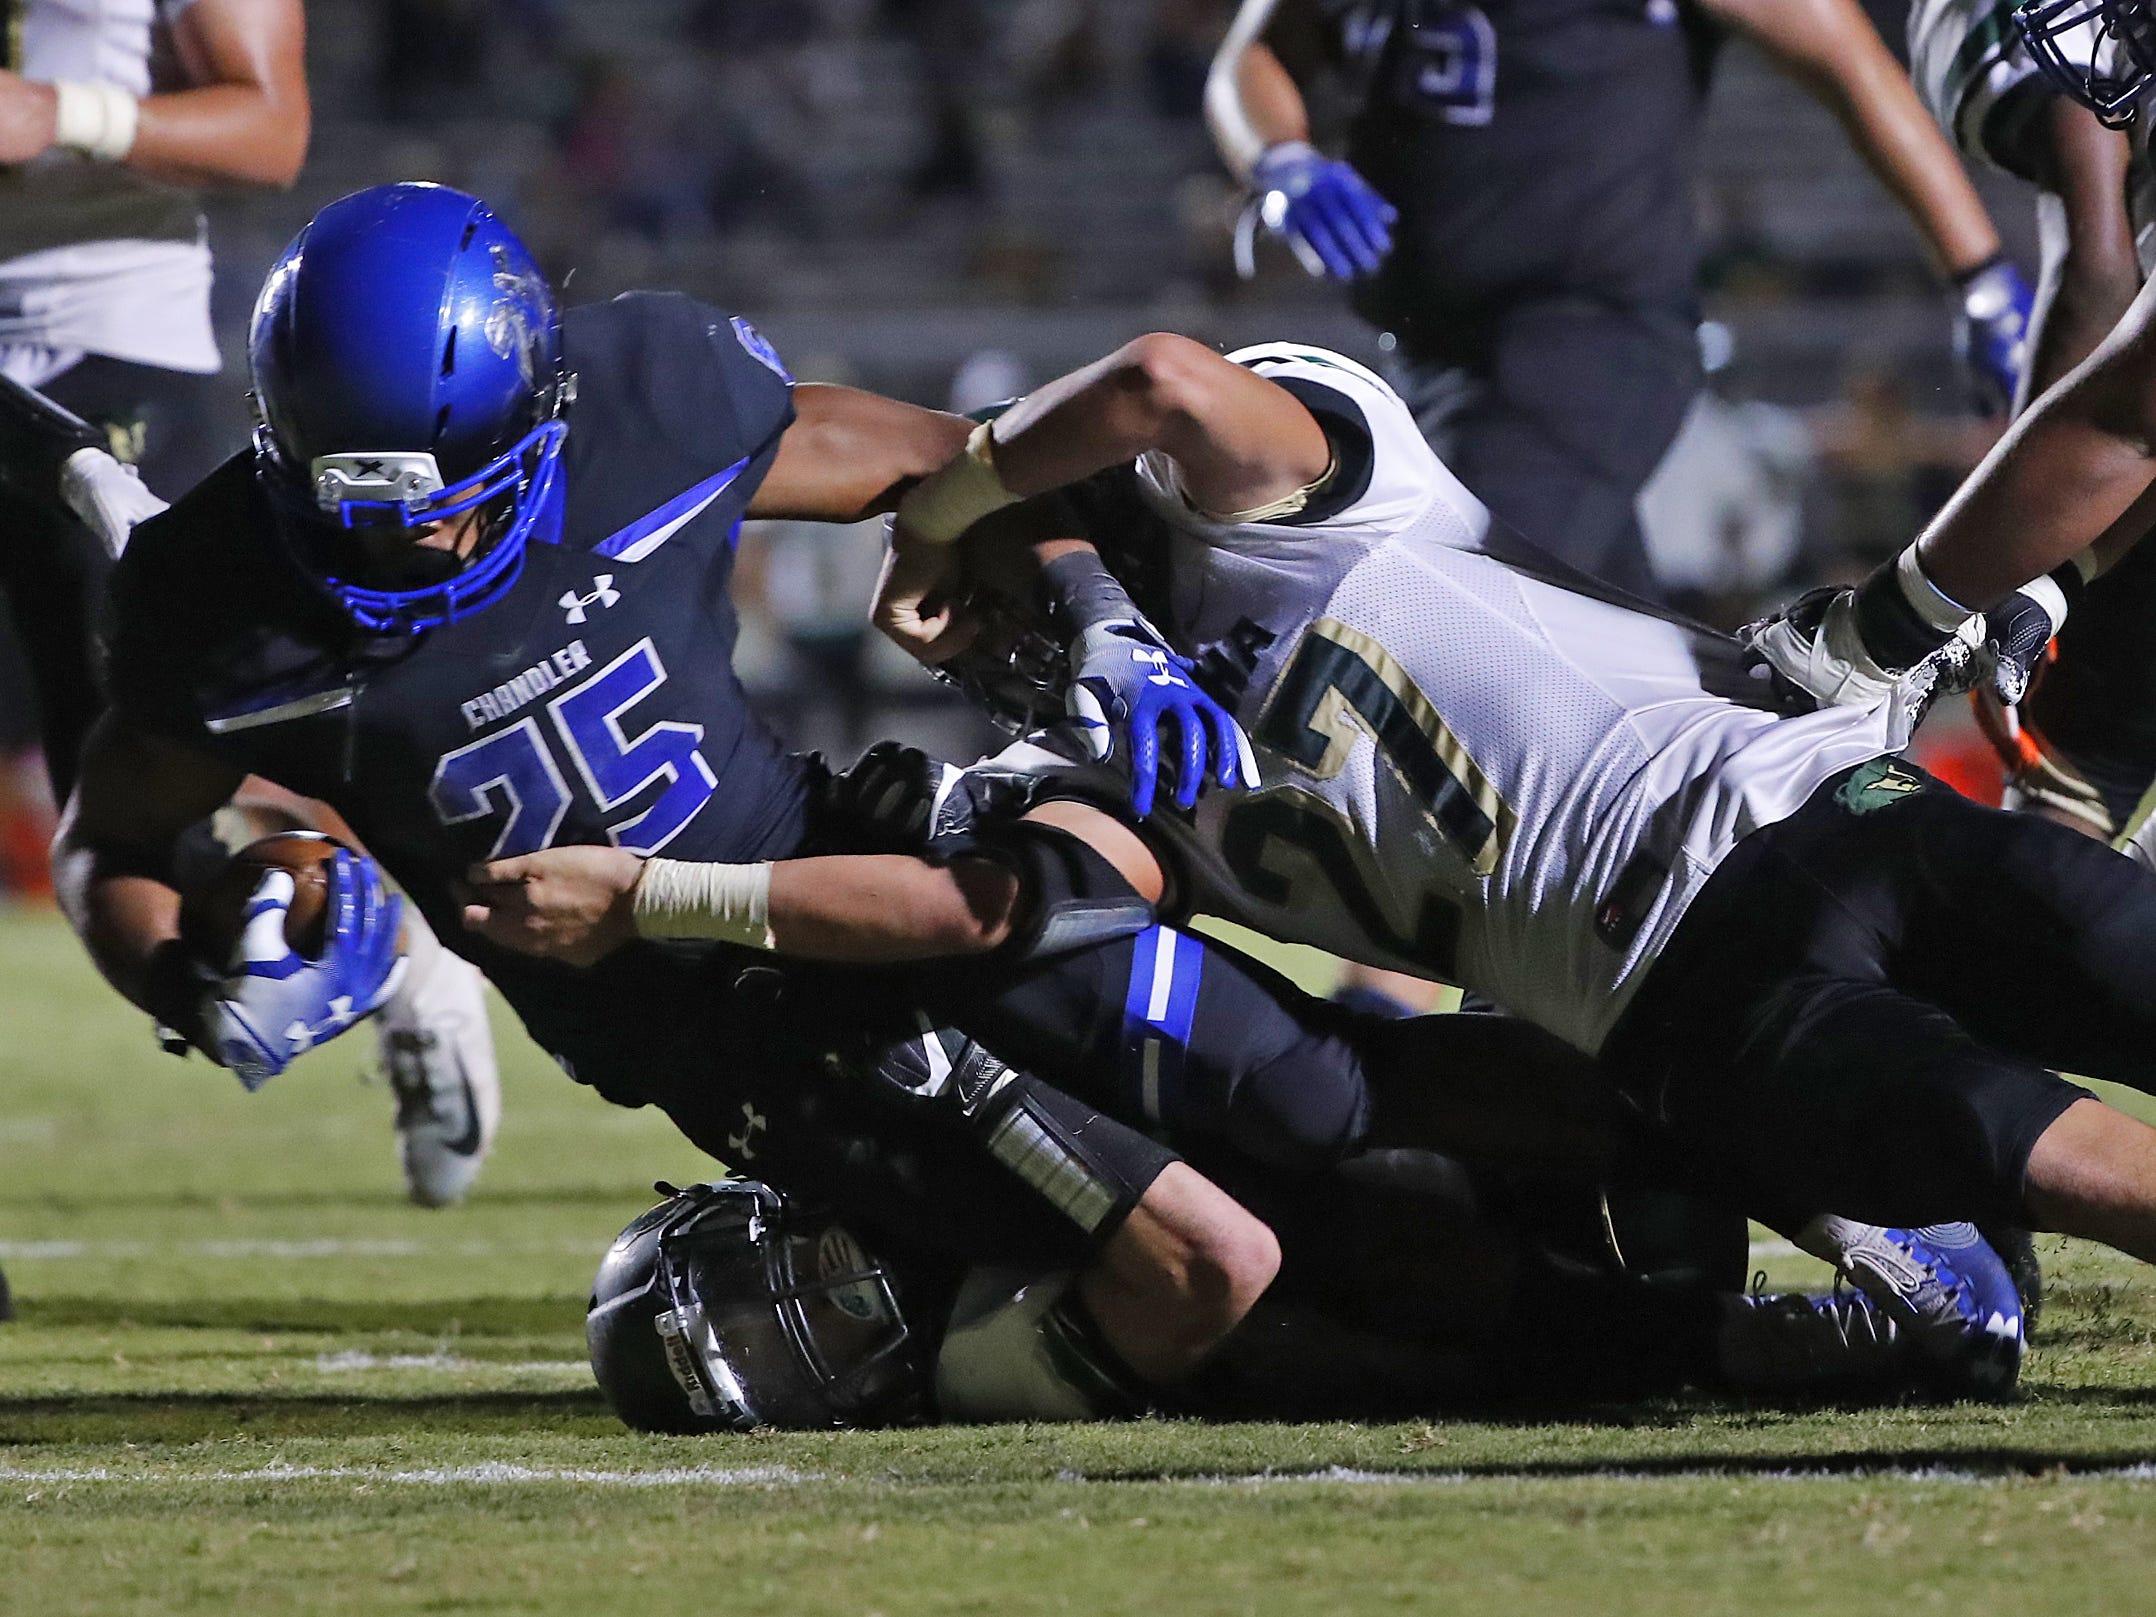 Chandler DeCarlos Brooks (25) scores a touchdown against Basha at Chandler High School in Chandler, Ariz. on October 12, 2018.